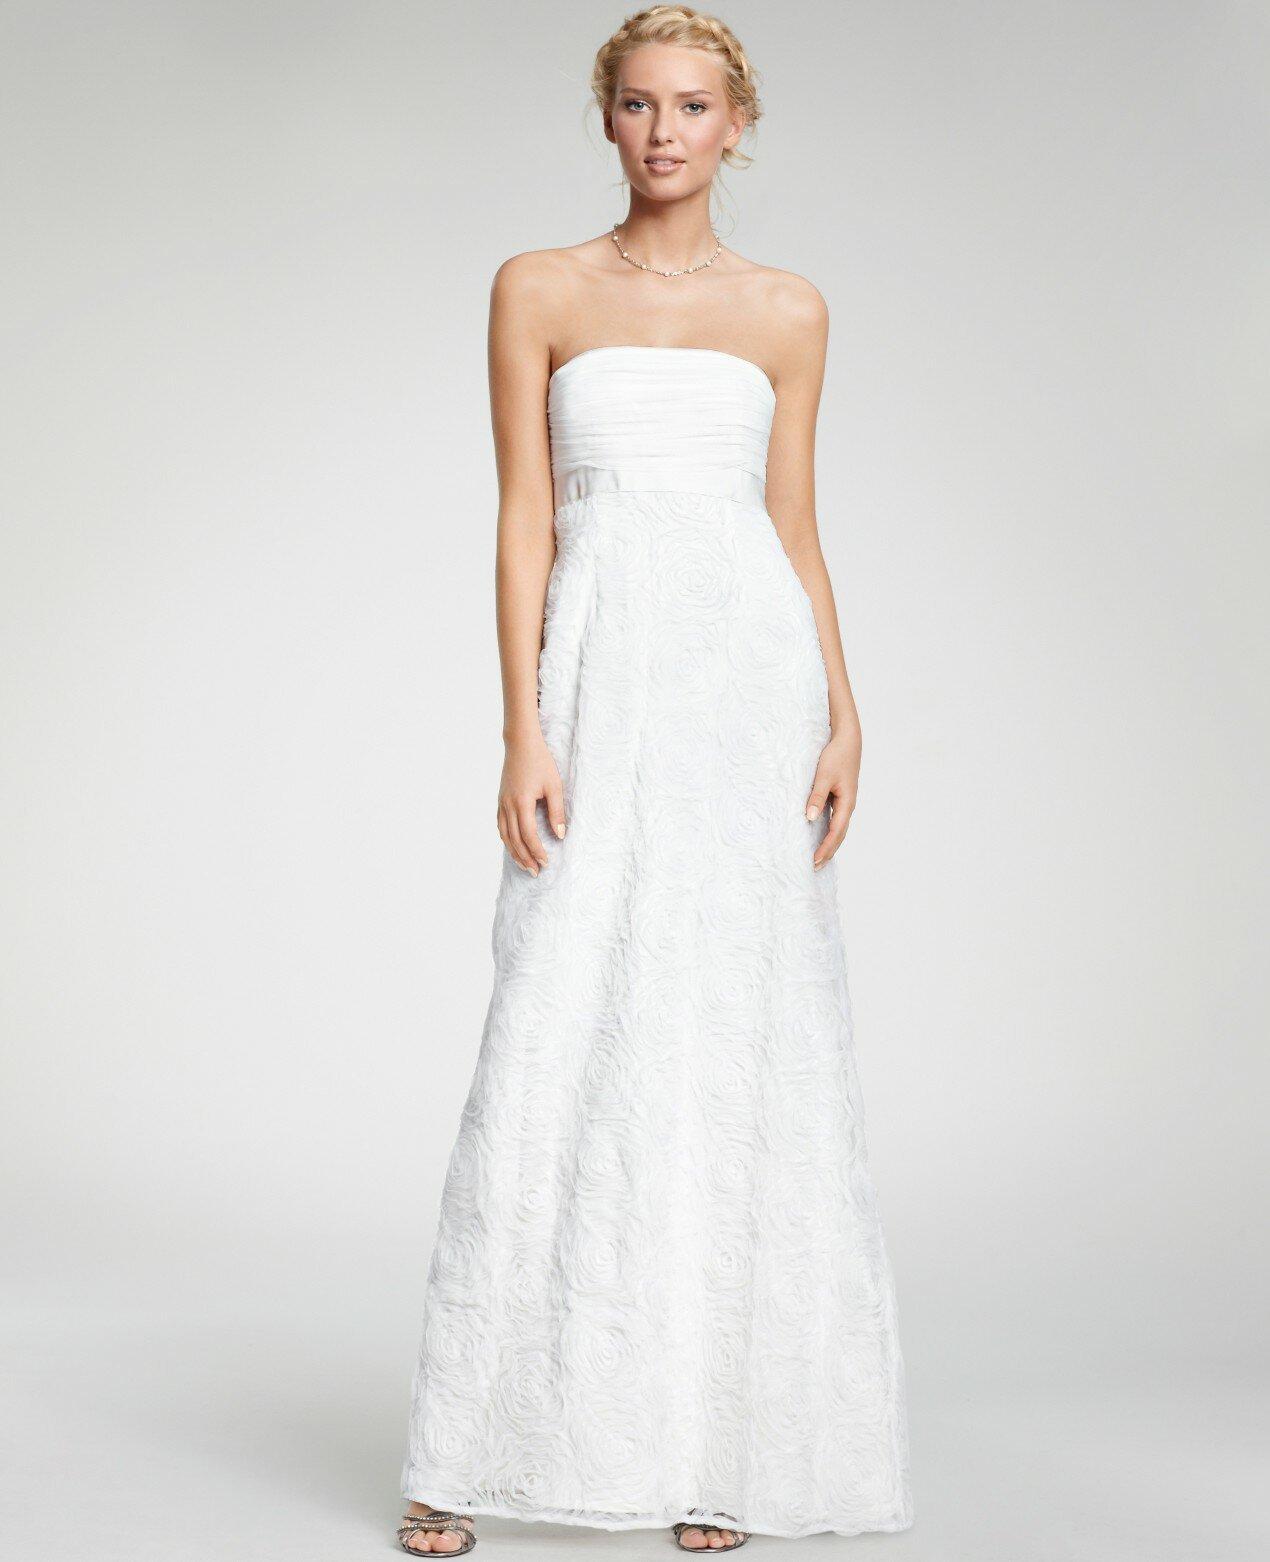 Ann taylor wedding dresses pictures ideas guide to buying ann taylor wedding dresses pictures ideas guide to buying stylish wedding dresses ombrellifo Images